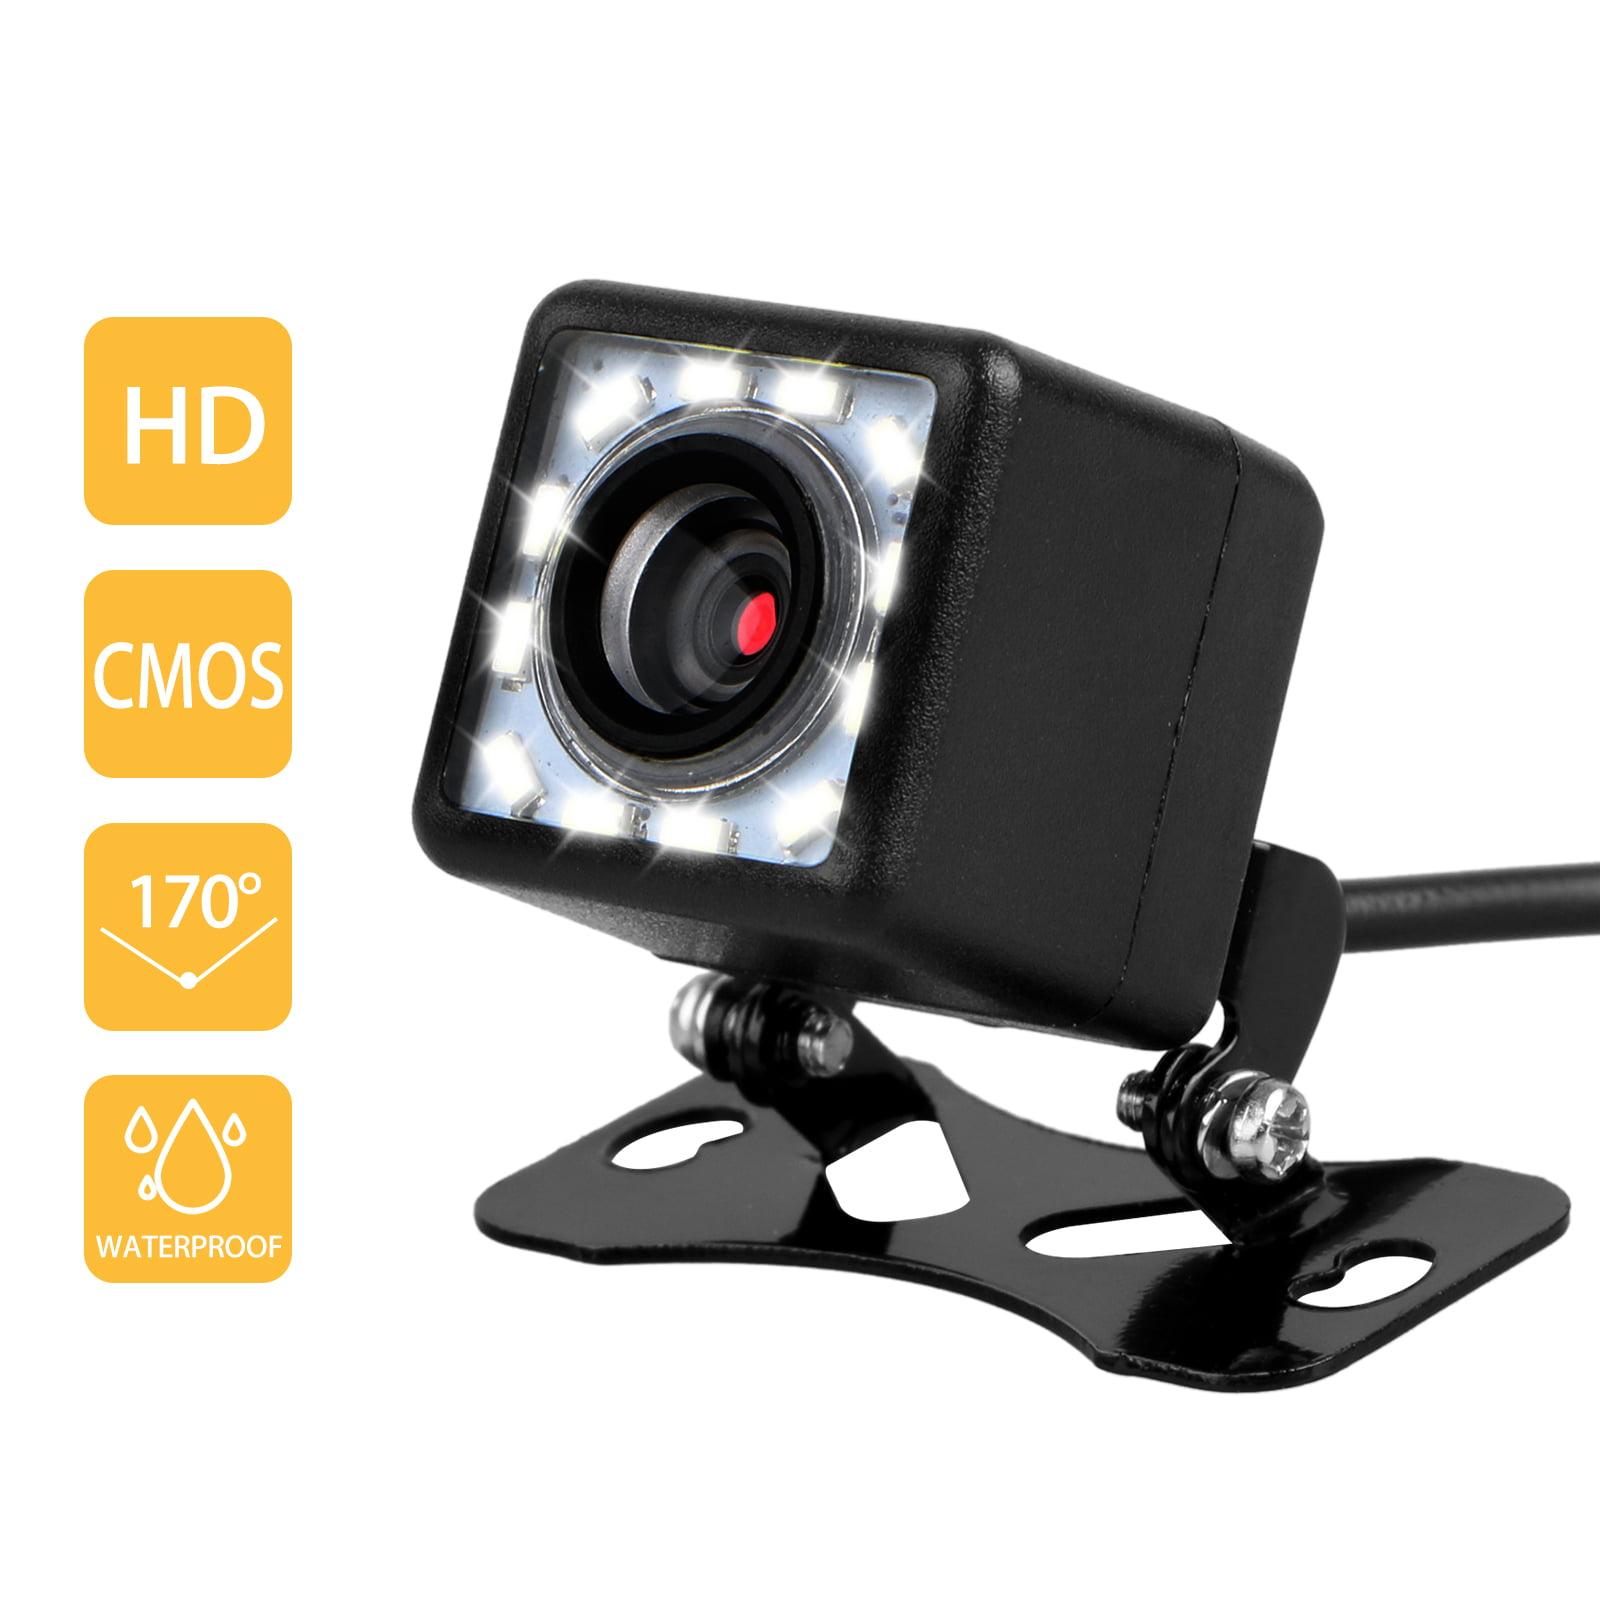 Night Vision Backup Camera, Car Rear View Camera Waterproof High Definition 170 Degree Viewing Angle HD Video Recorder